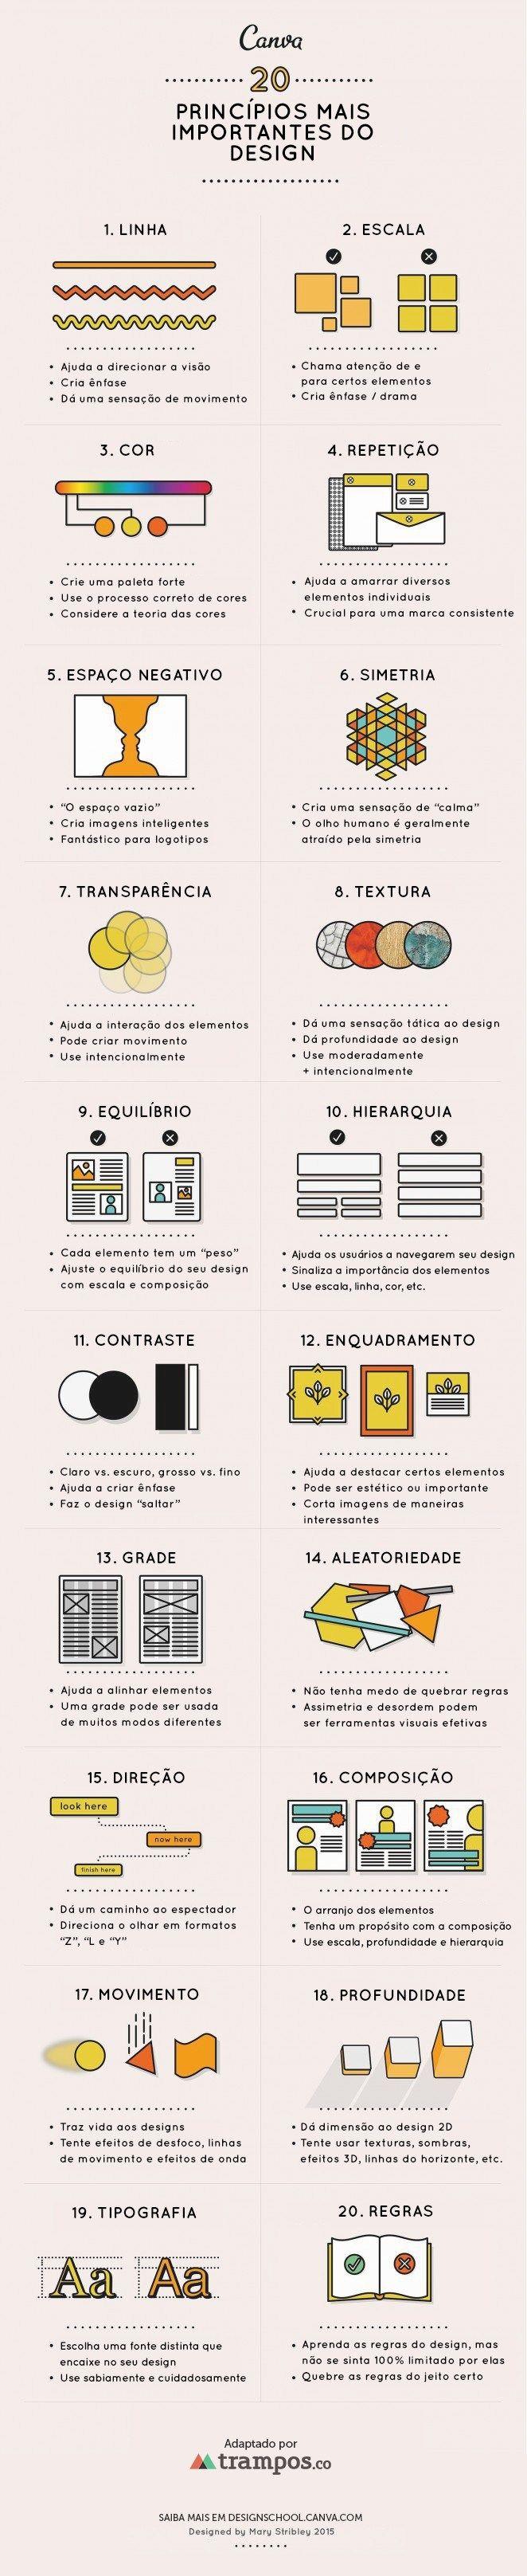 2016-06-20_principios-de-design (1)